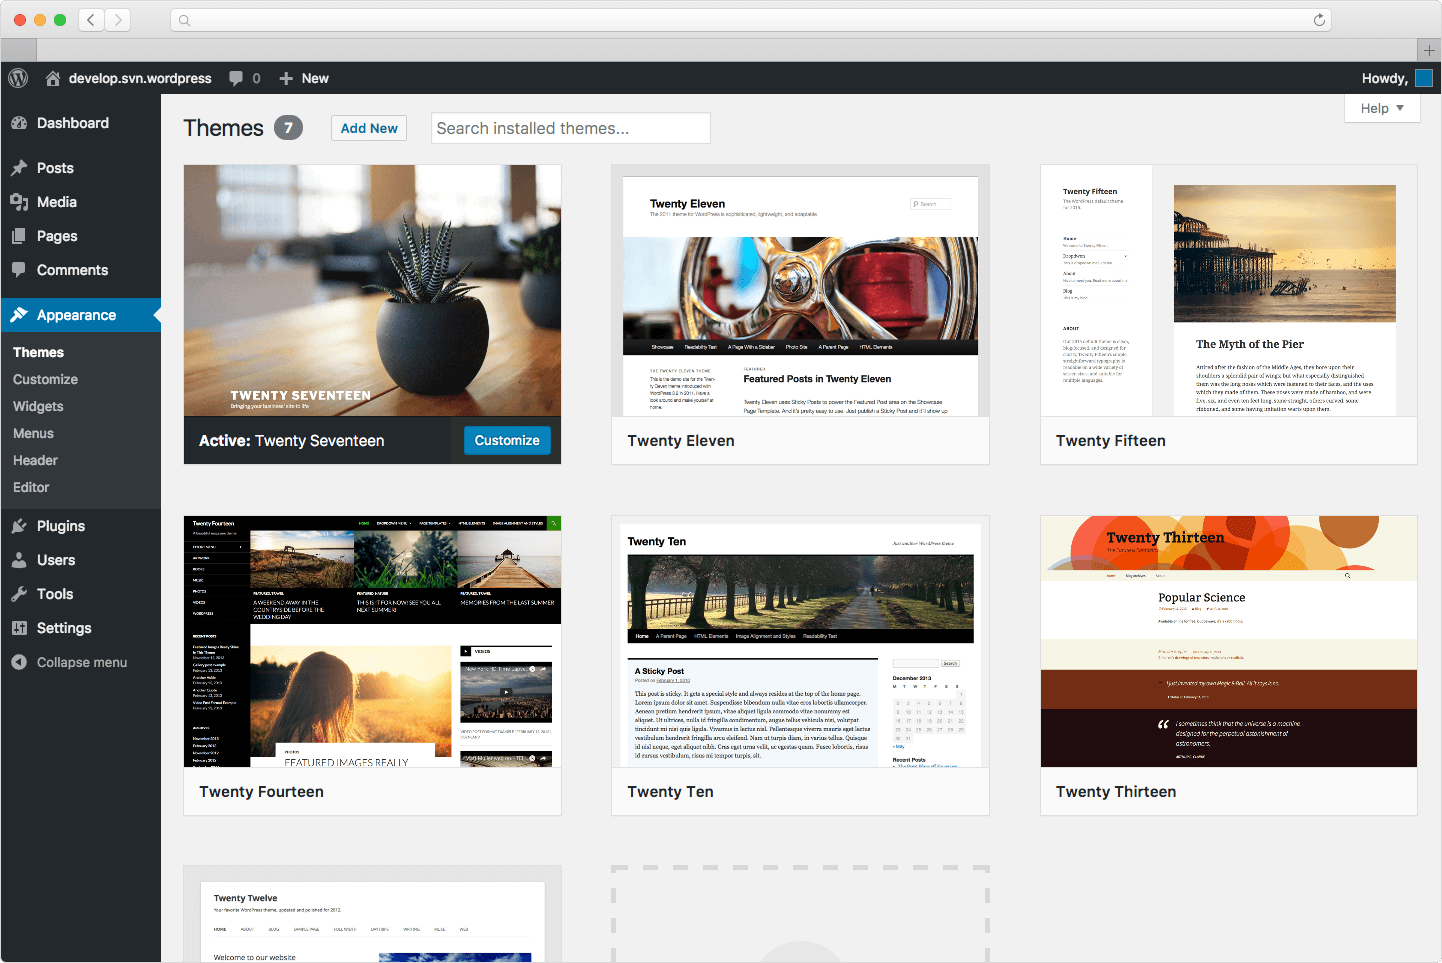 Wordpress - free graphic design software